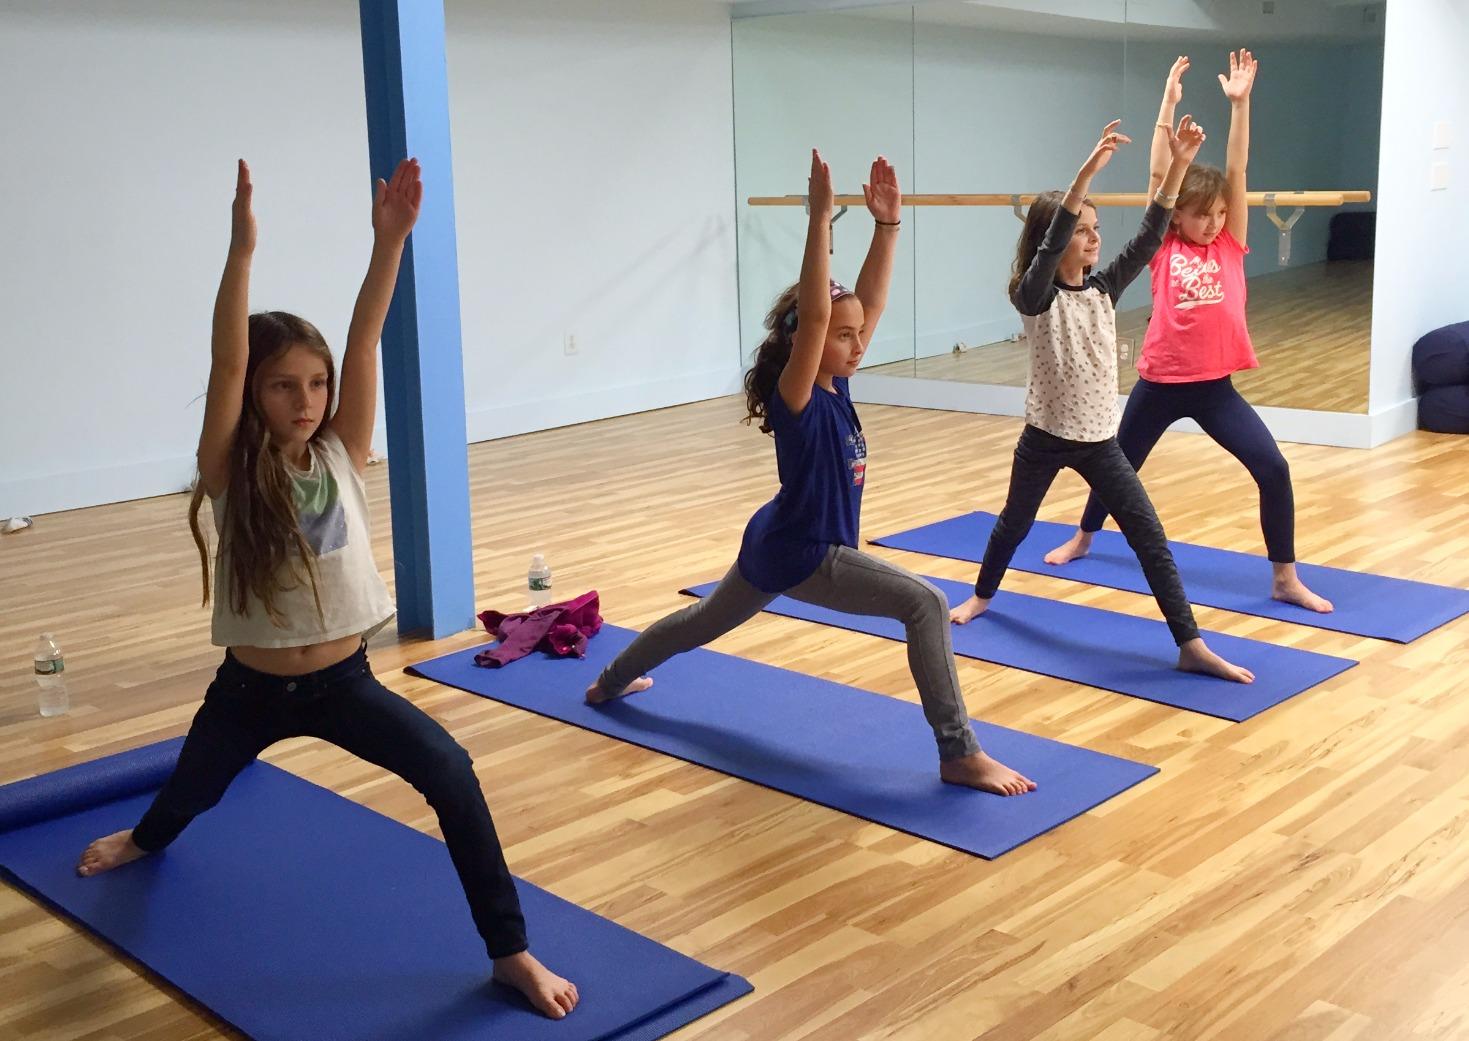 Yoga class teens, emmas fetish artist